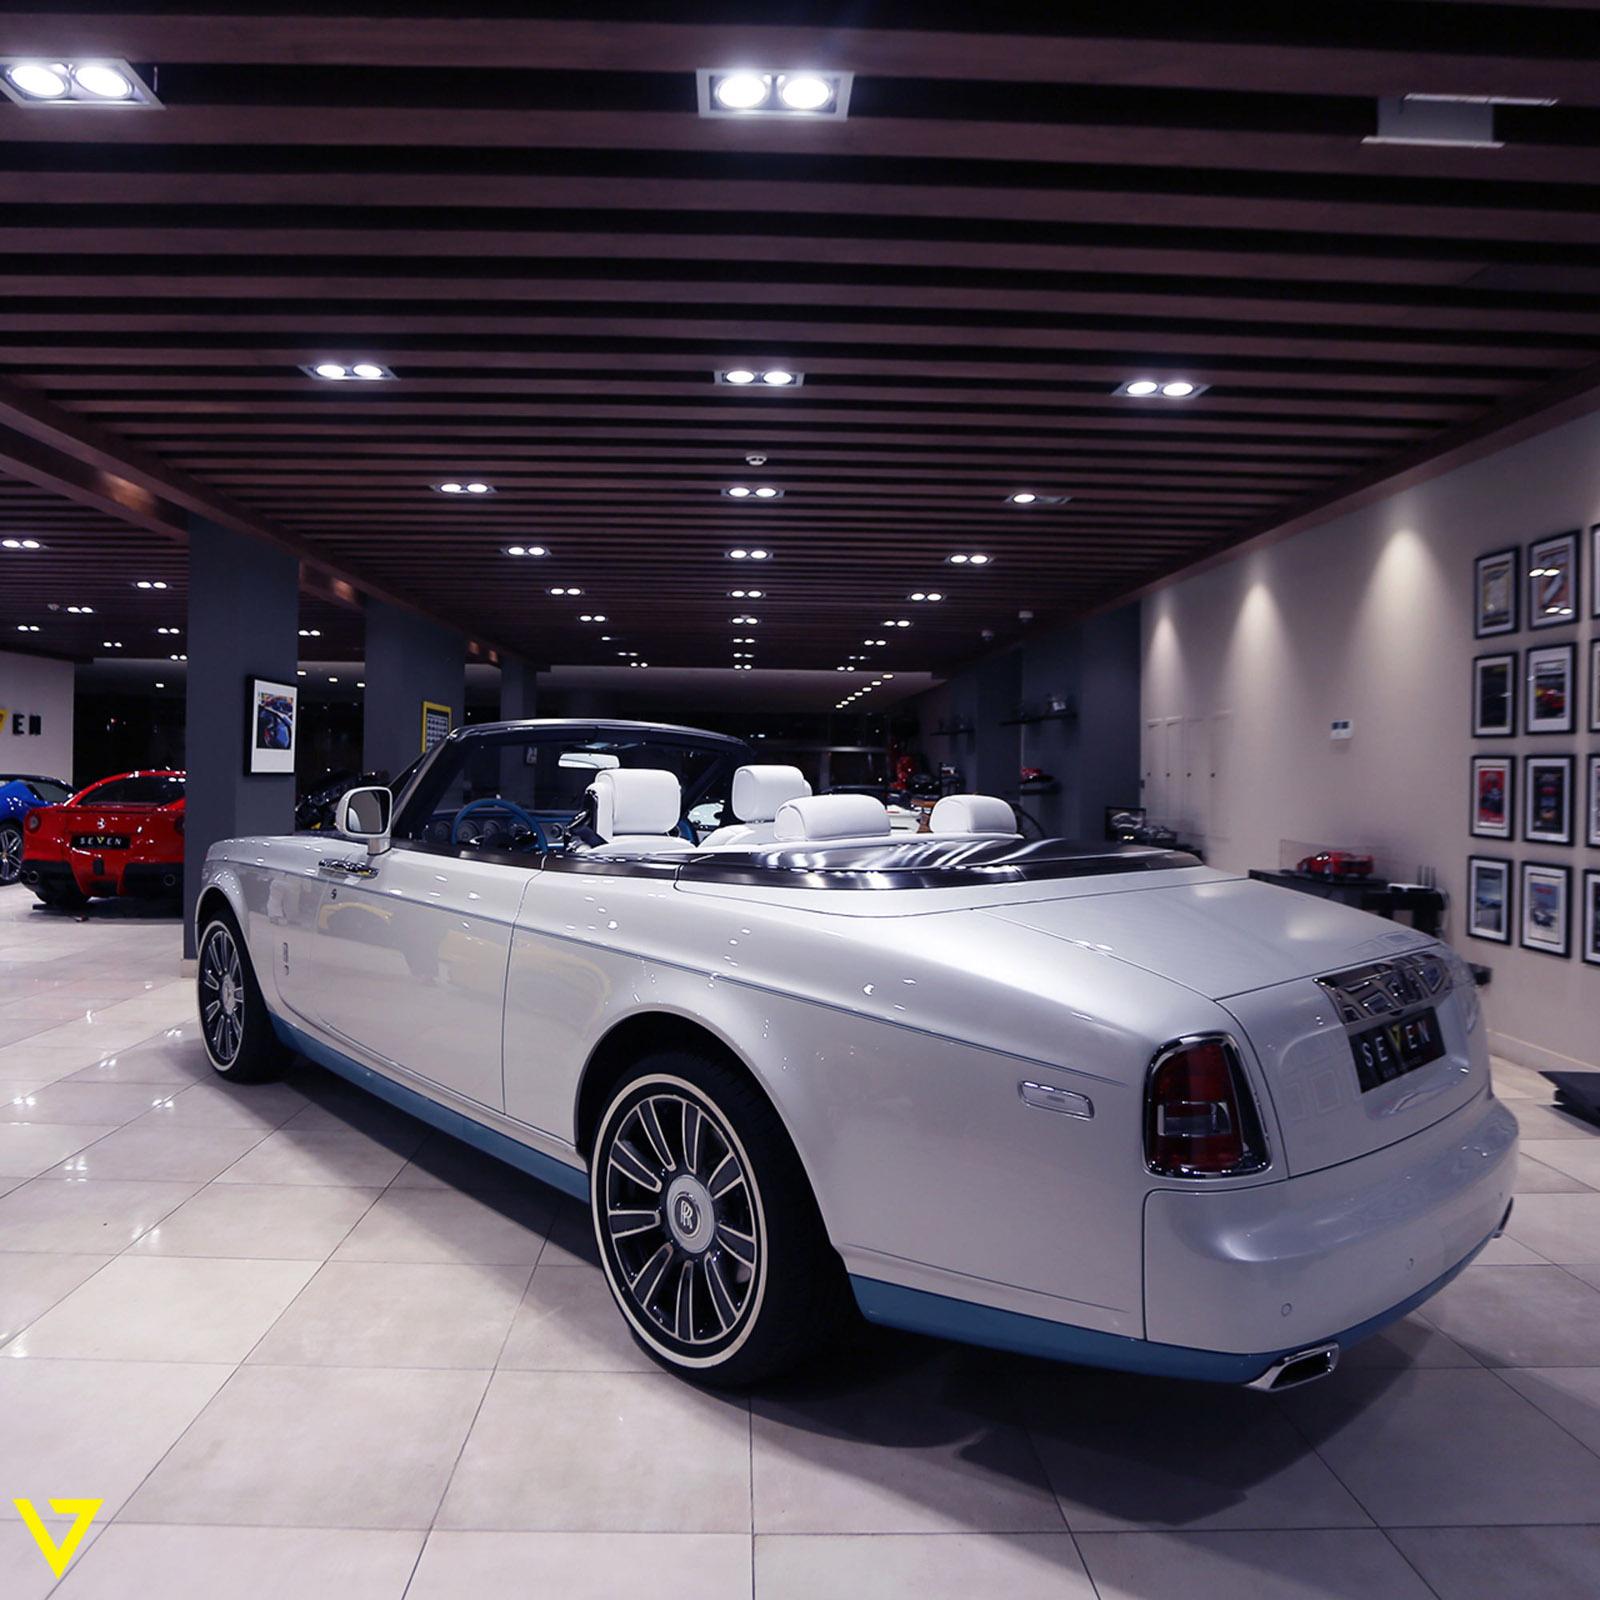 Rolls-Royce_Phantom_Drophead_Coupe_Last-of-Last_edition_08